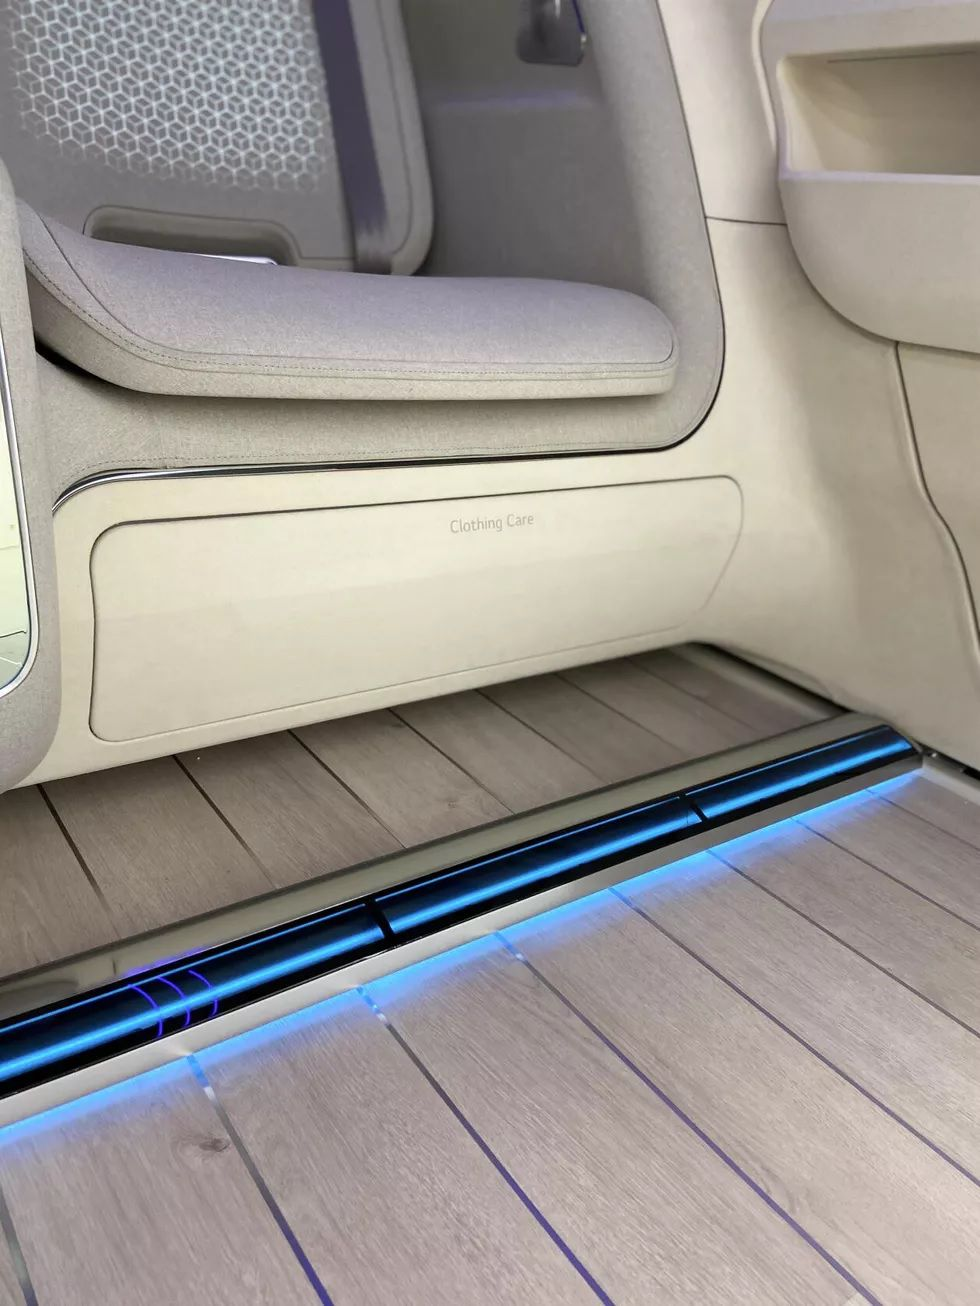 LG Hyundai EVs Cabin 3 طرح مفهومی هیوندای و ال جی برای کابین خودروهای برقی: ربات و تلویزیون غول پیکر اخبار IT